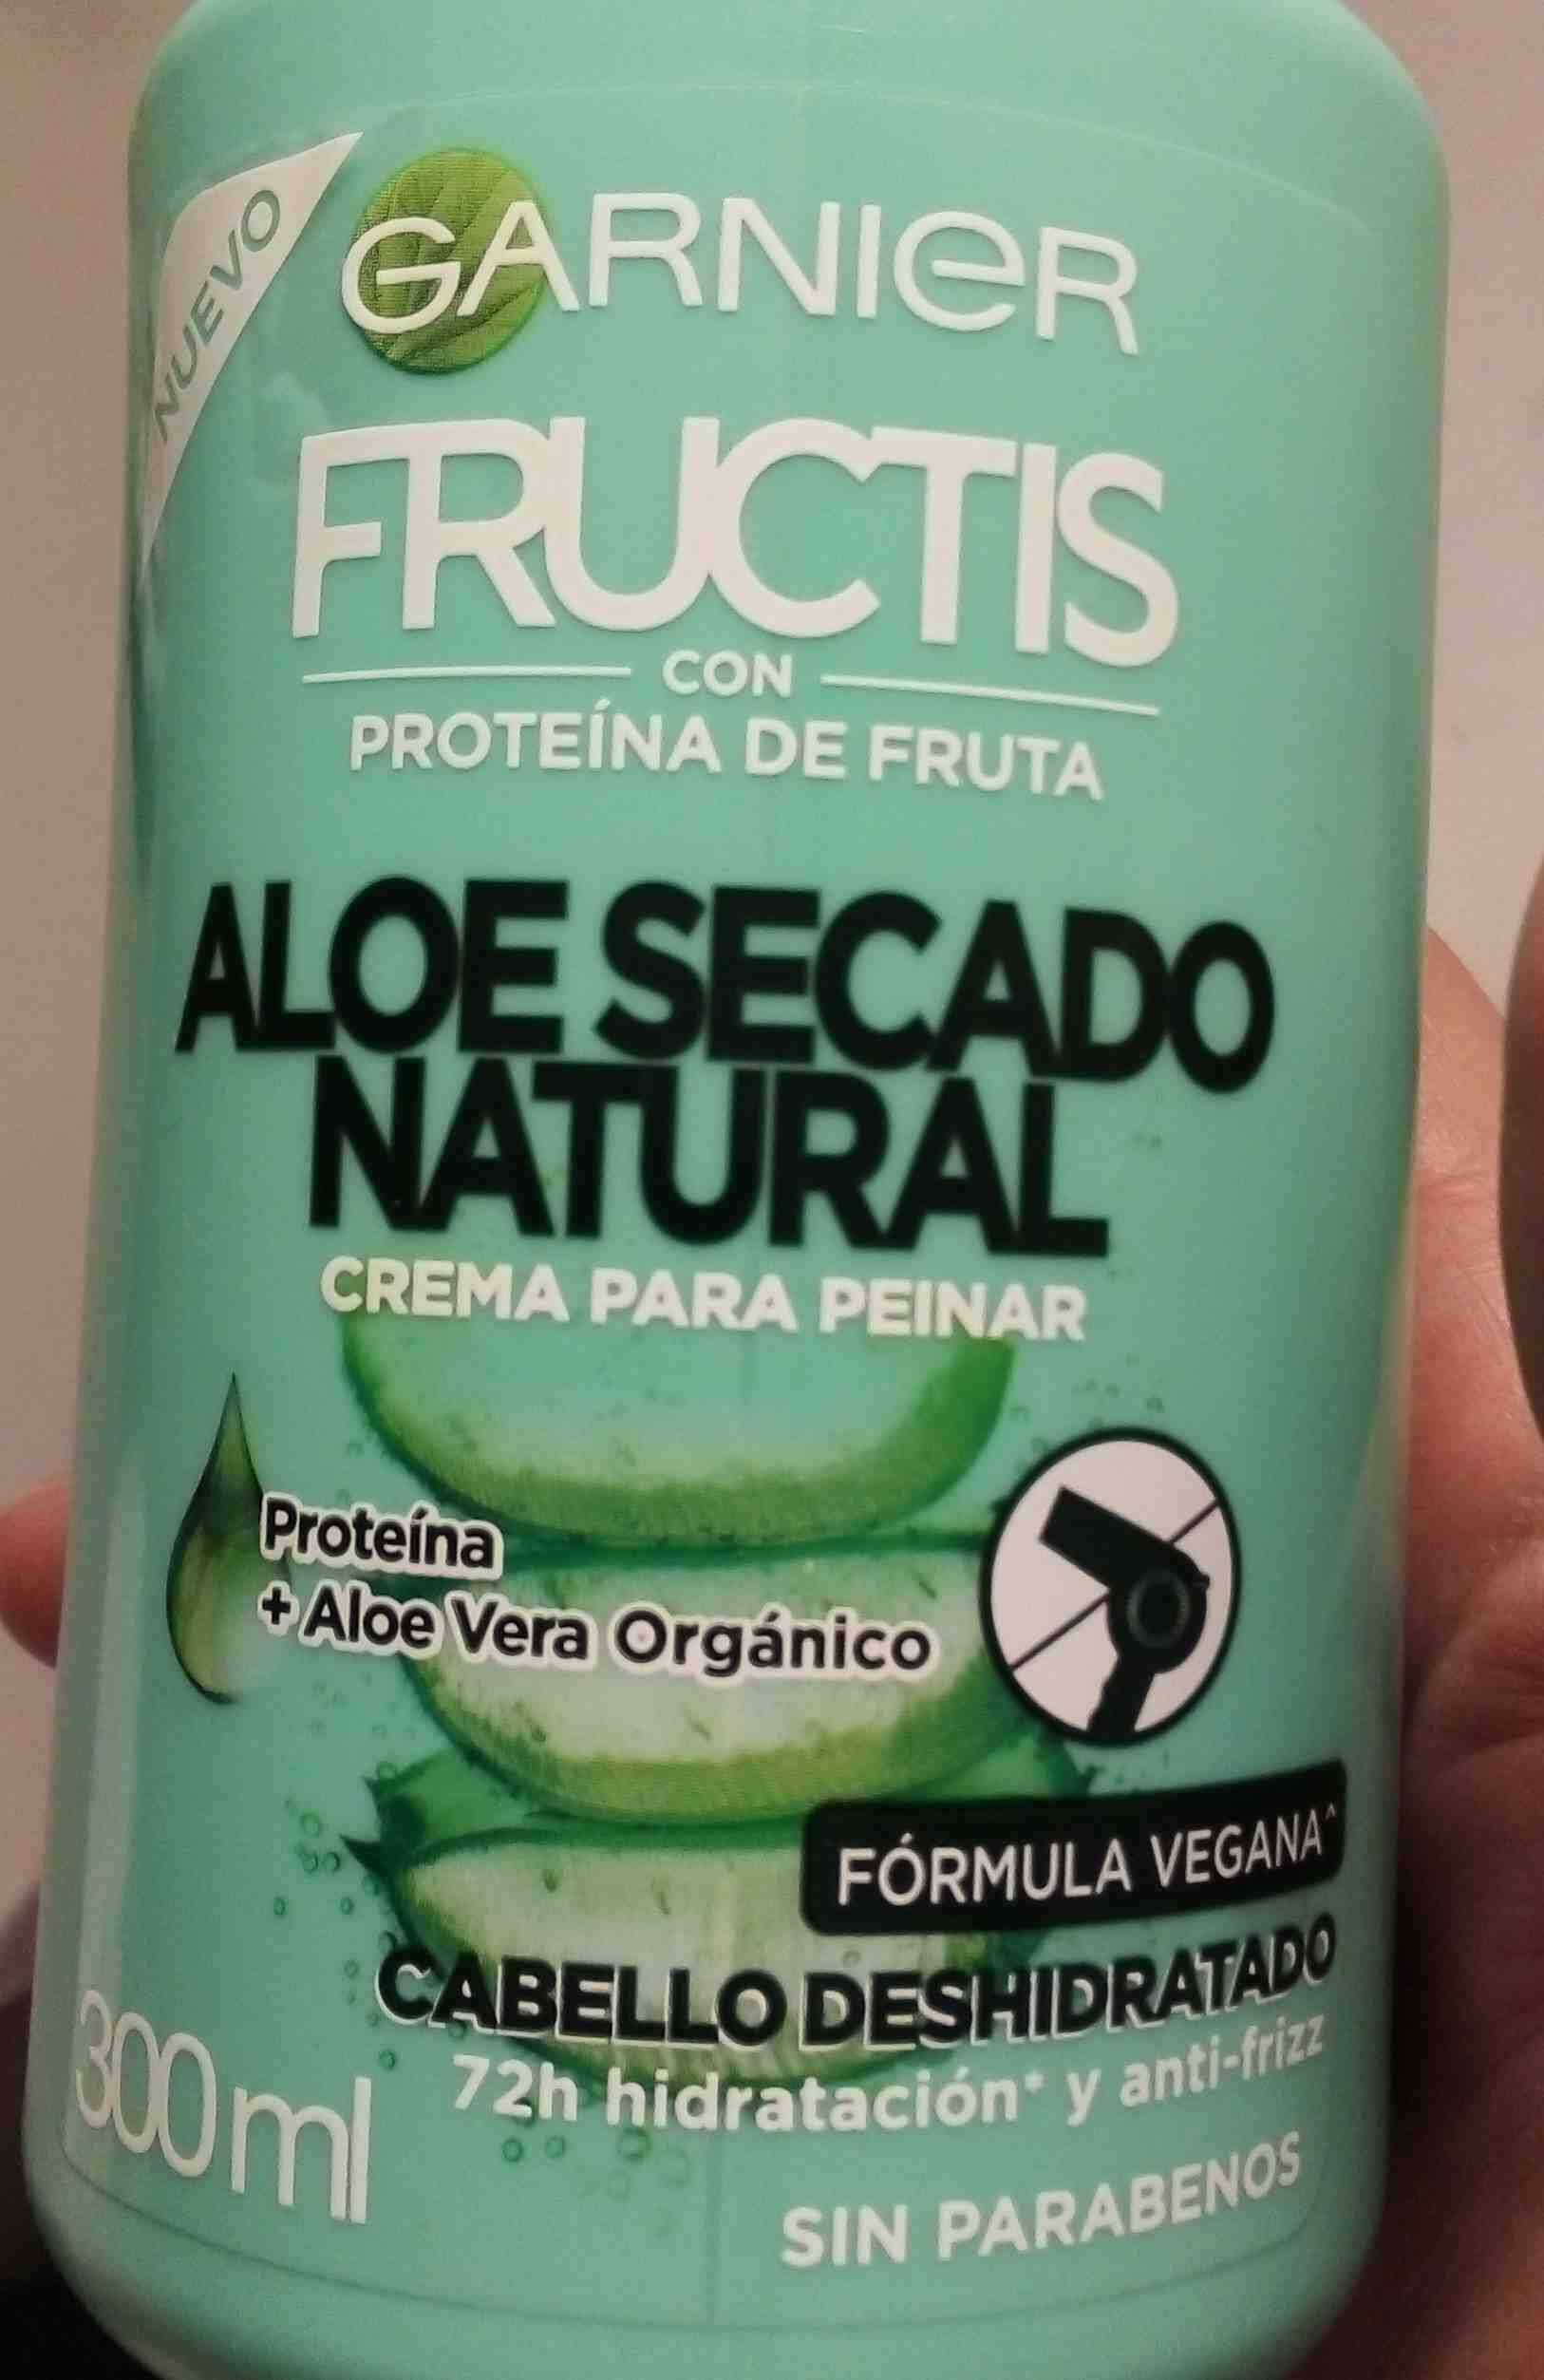 Garnier Fructis aloe - Product - en